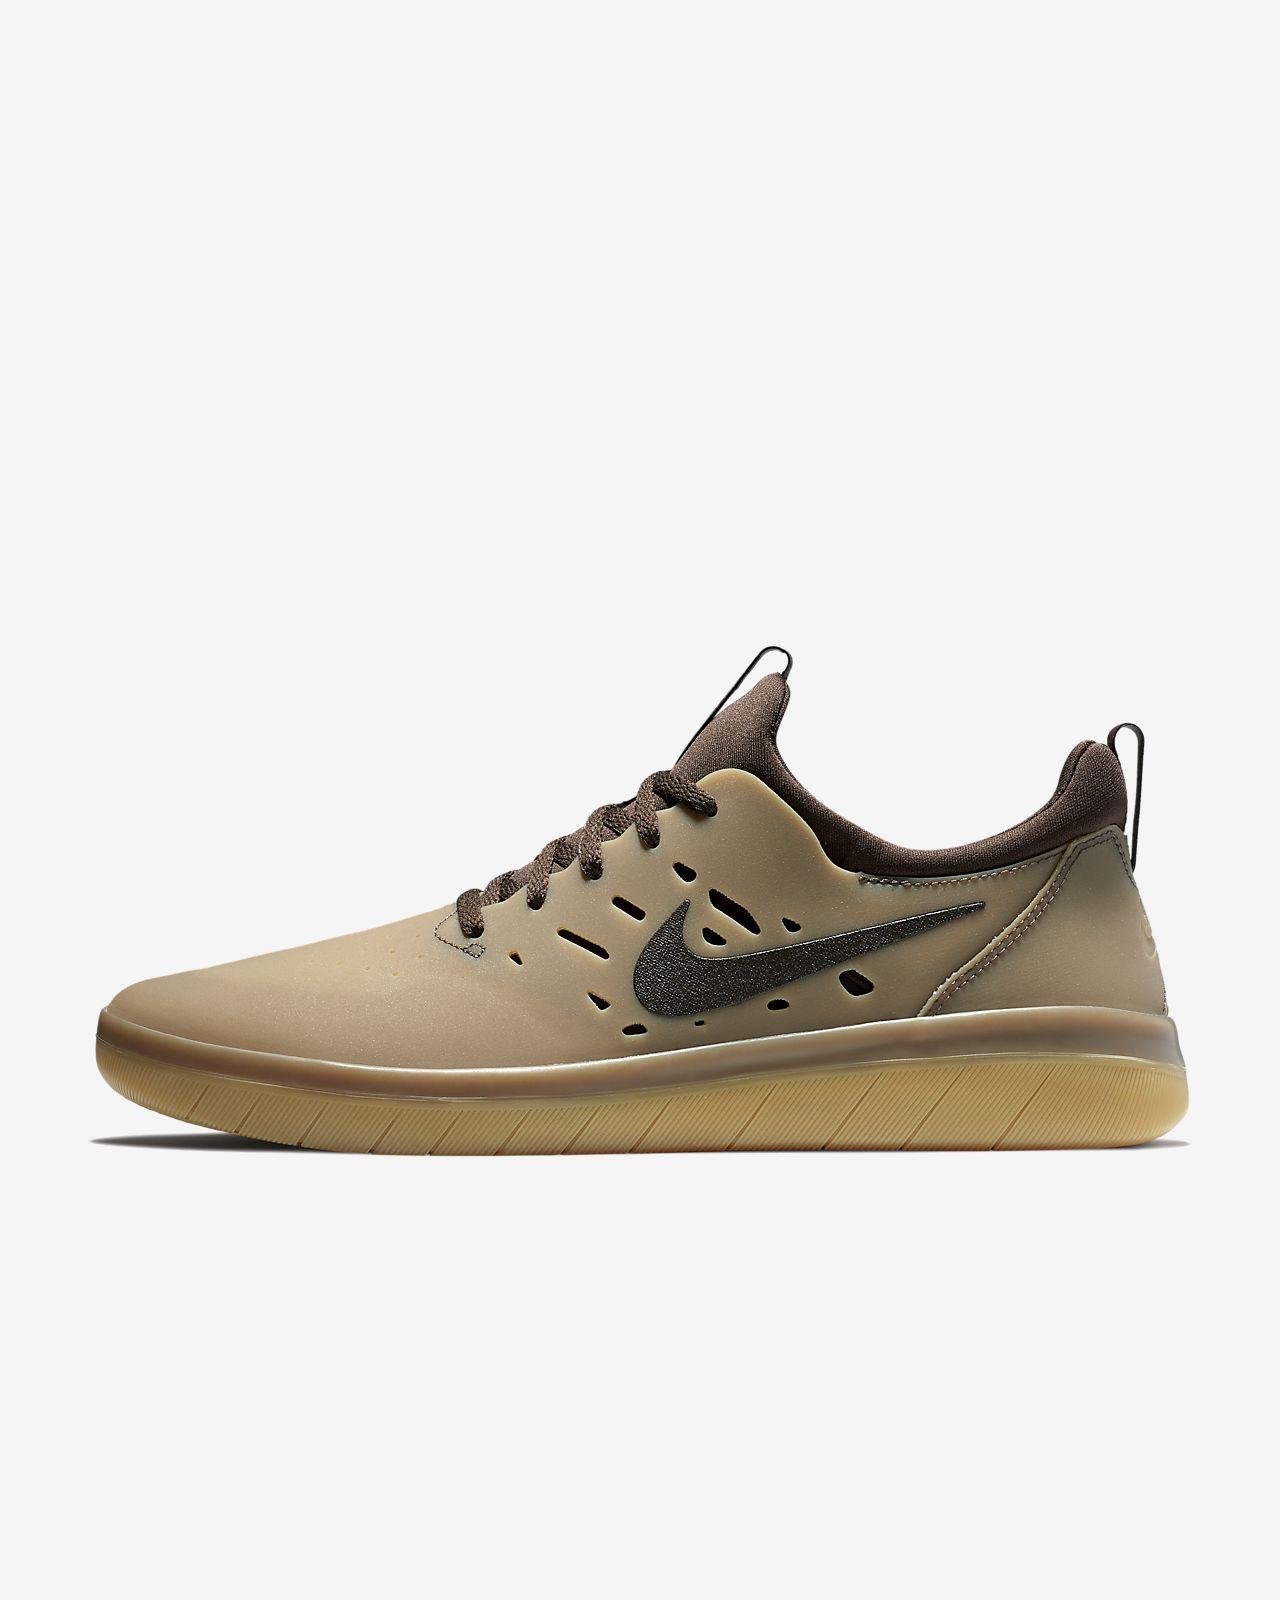 Marron Zoom Stefan 12 Clair Chaussures EU 42 Janoski Nike de CNVS qrYw4XYx